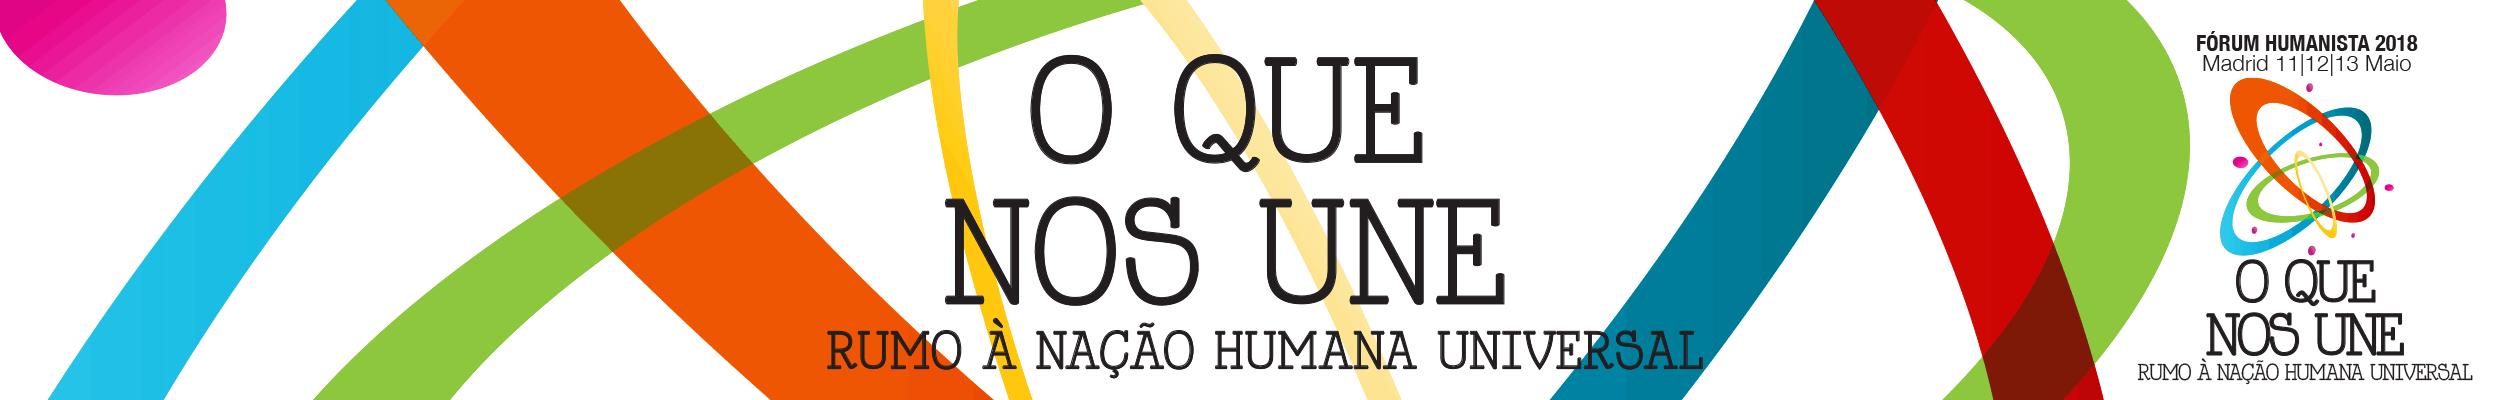 Fórum Humanista